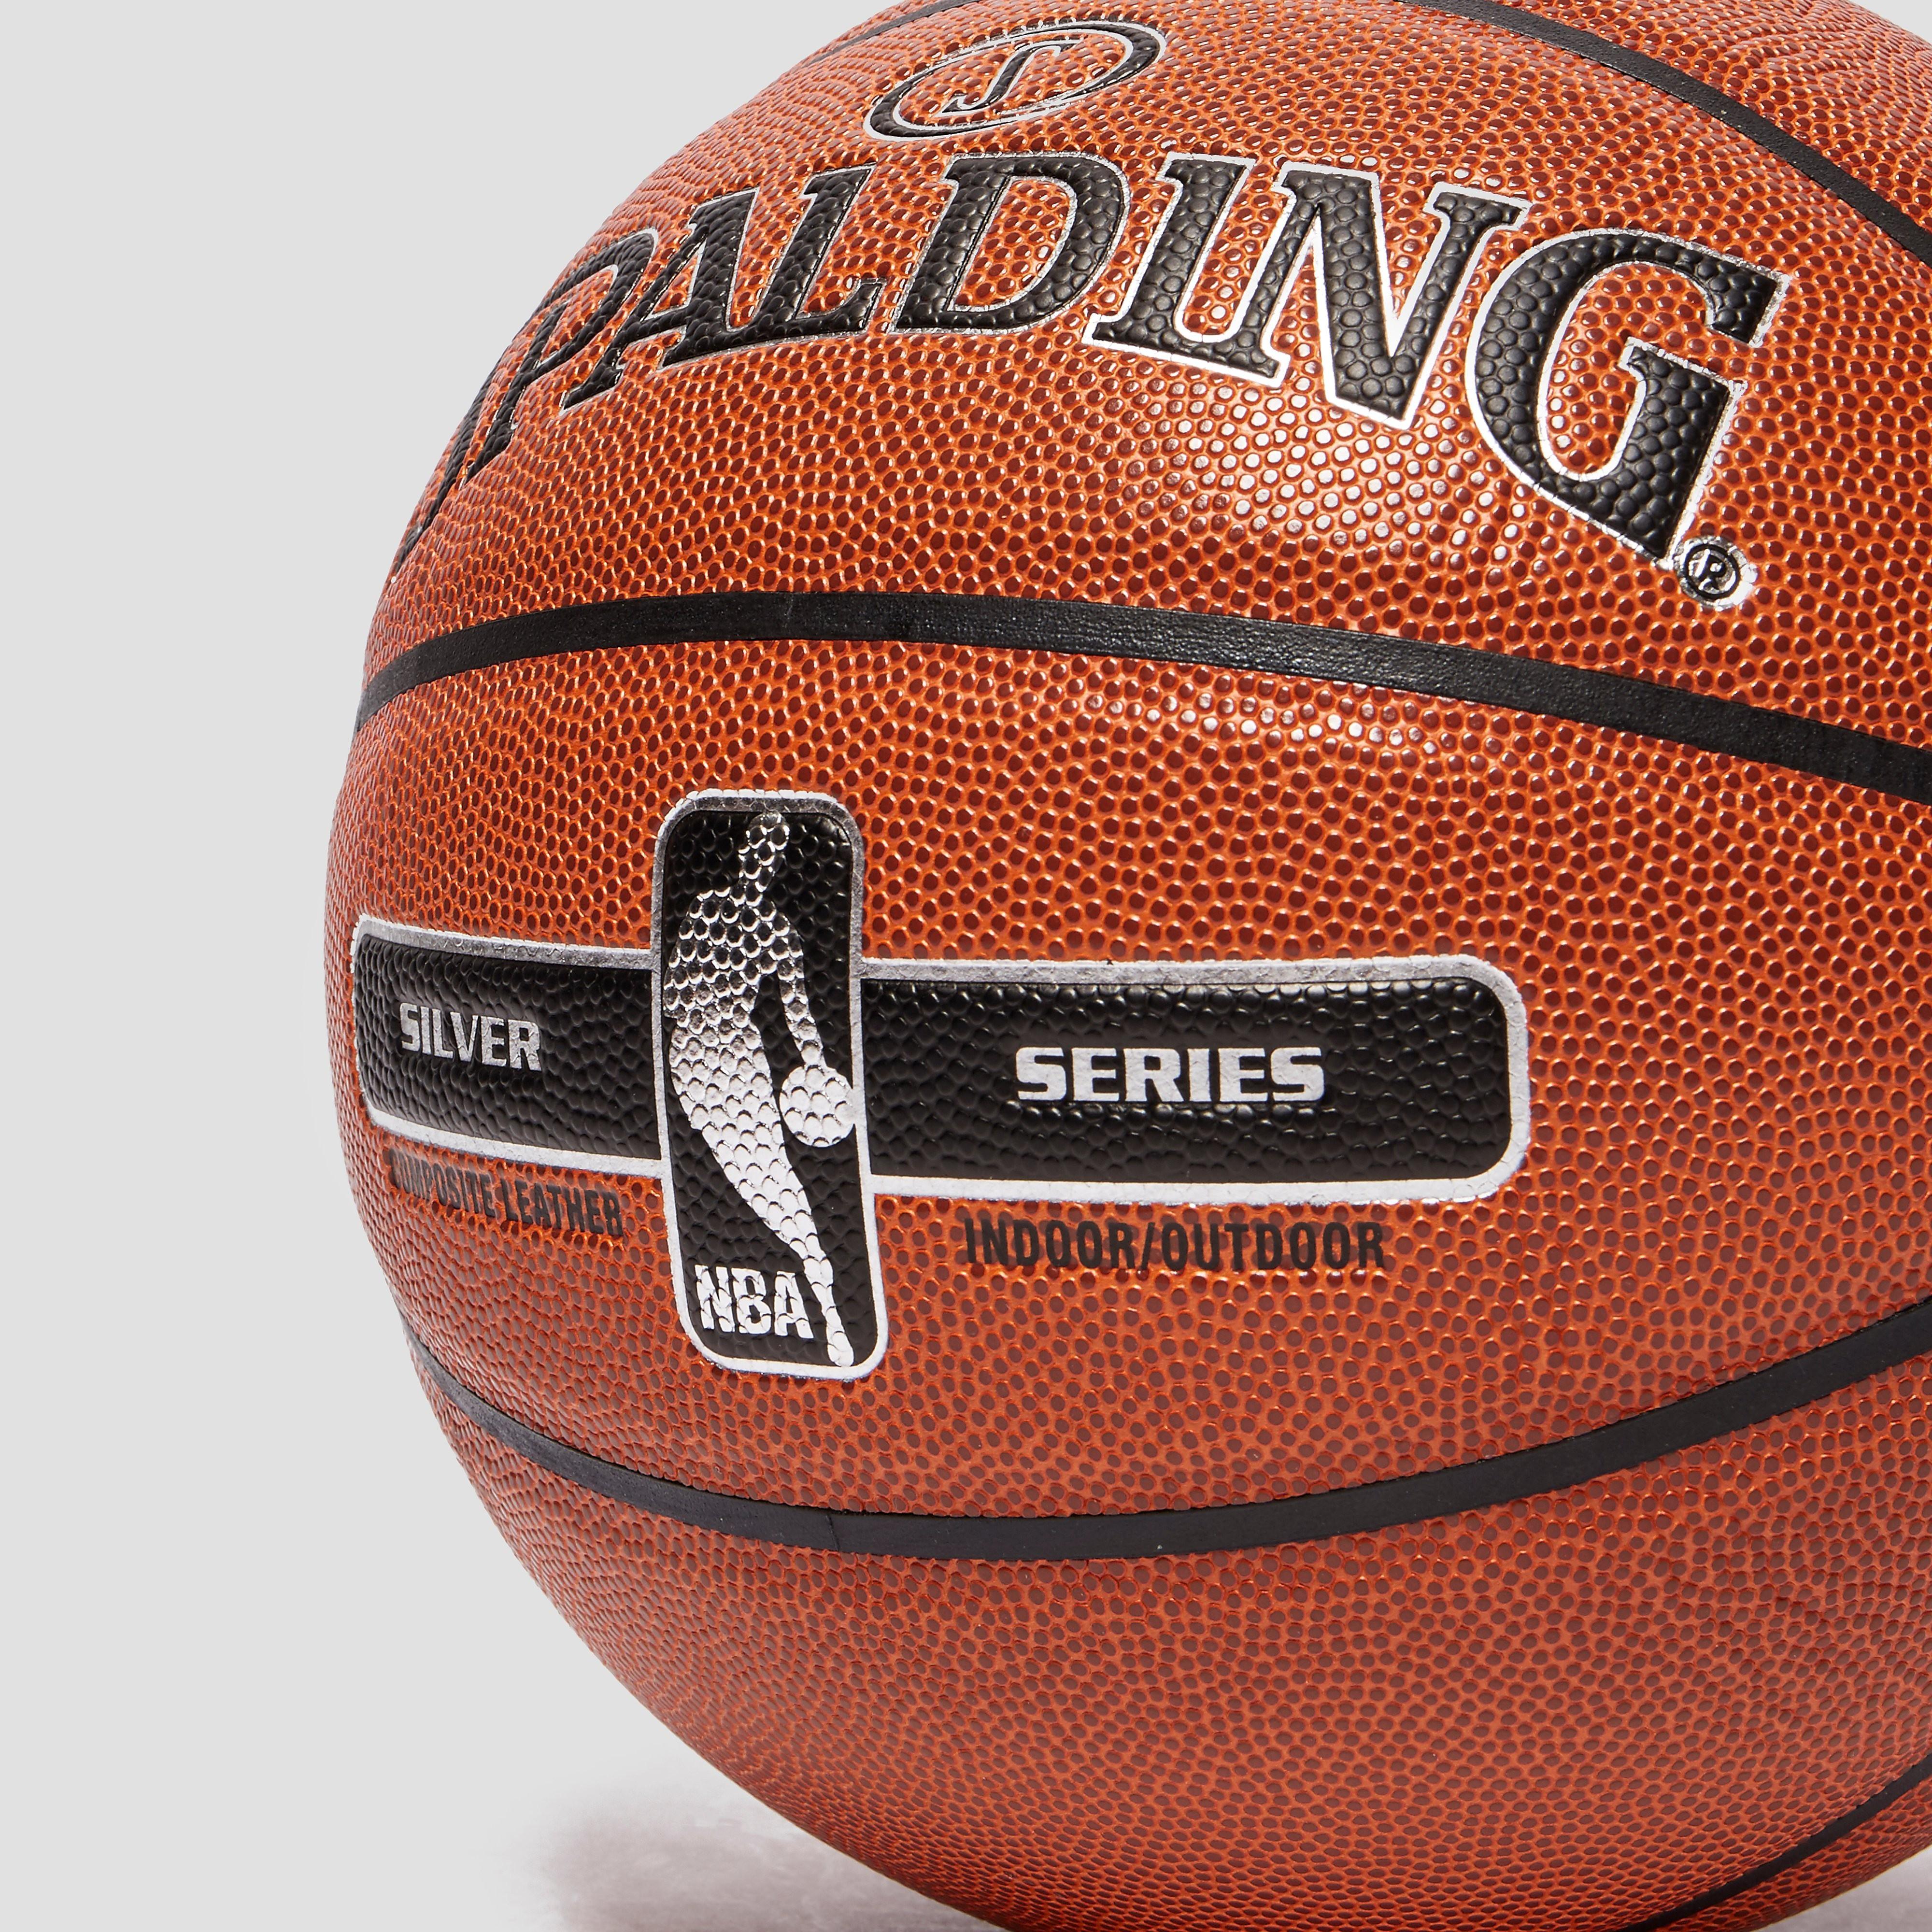 Spalding NBA Indoor/Outdoor Basketball